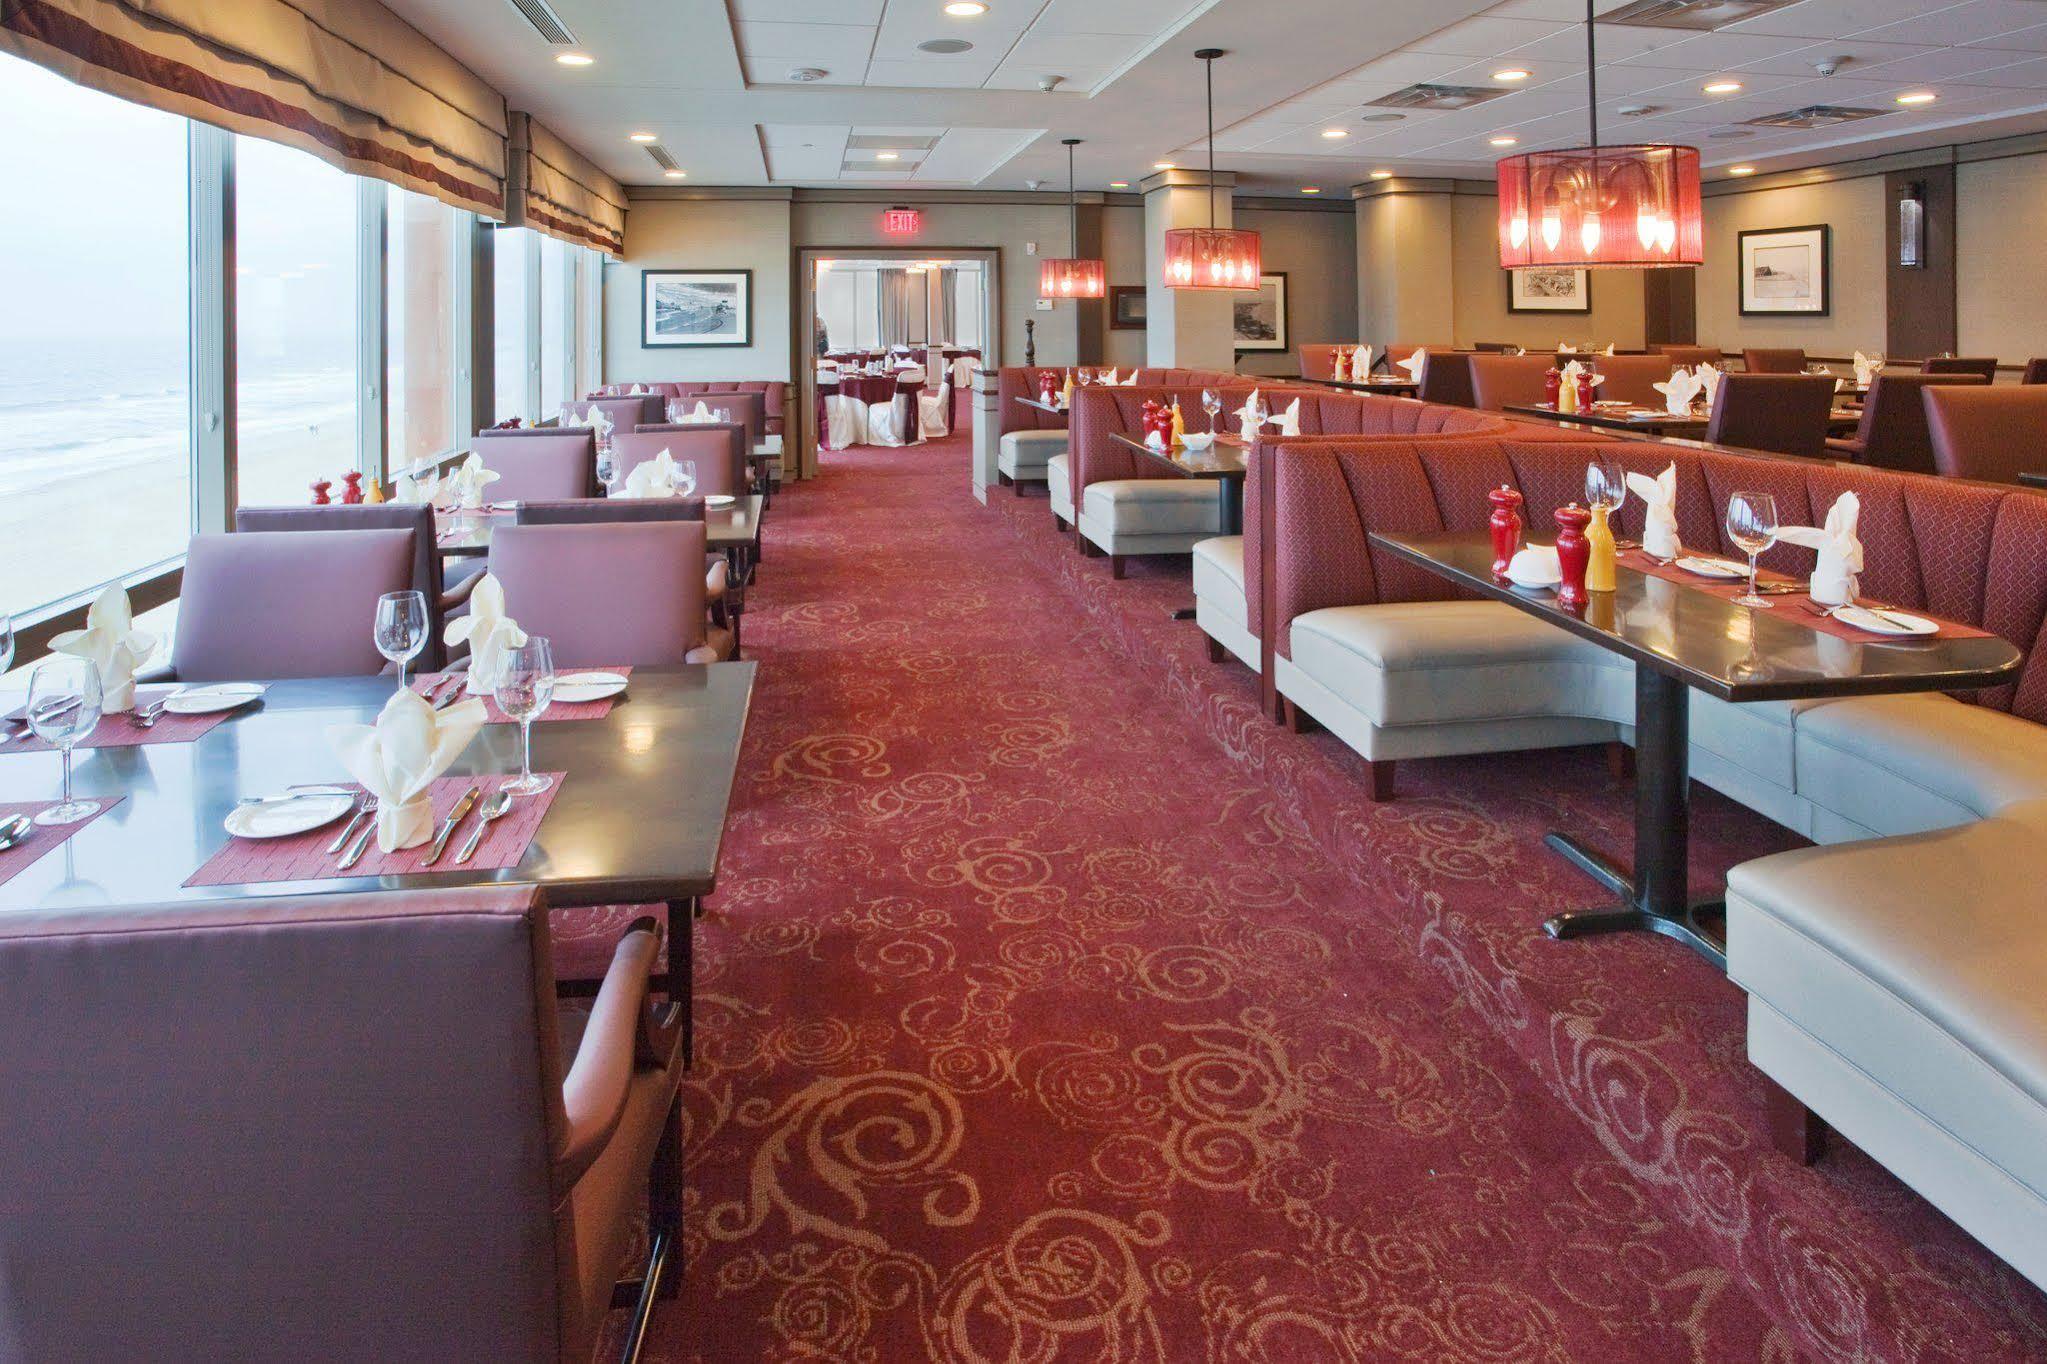 Holiday Inn and Suites Virginia Beach North Beach